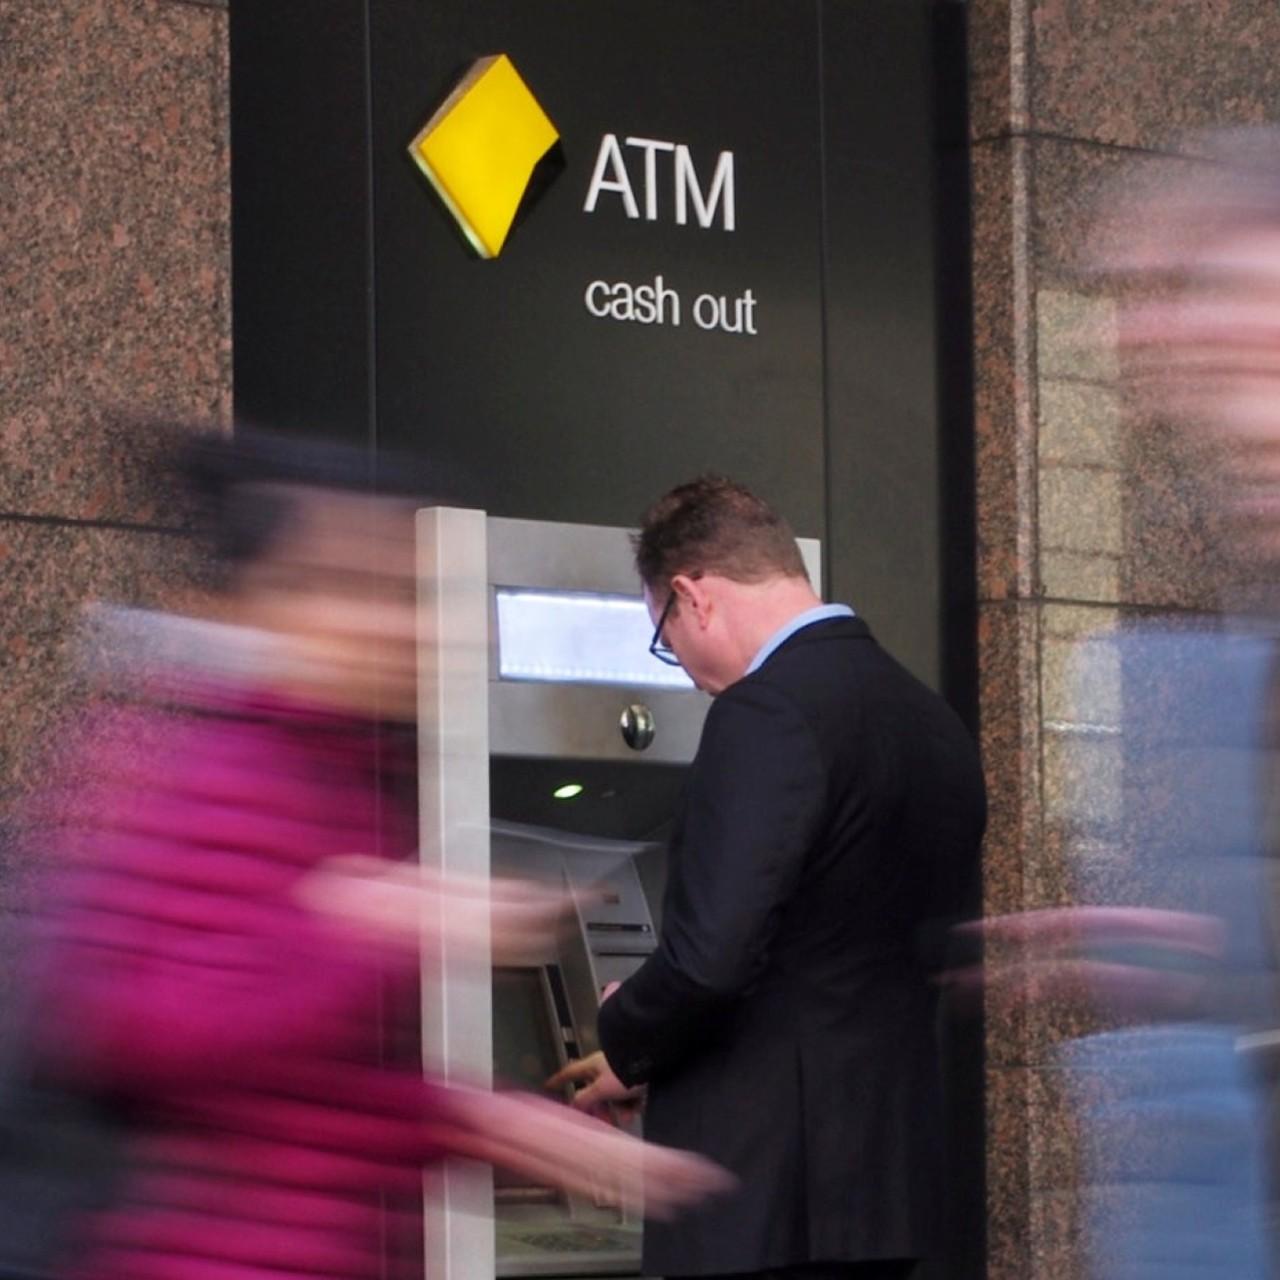 Australia's landmark banking inquiry: Tighter regulations, crackdown